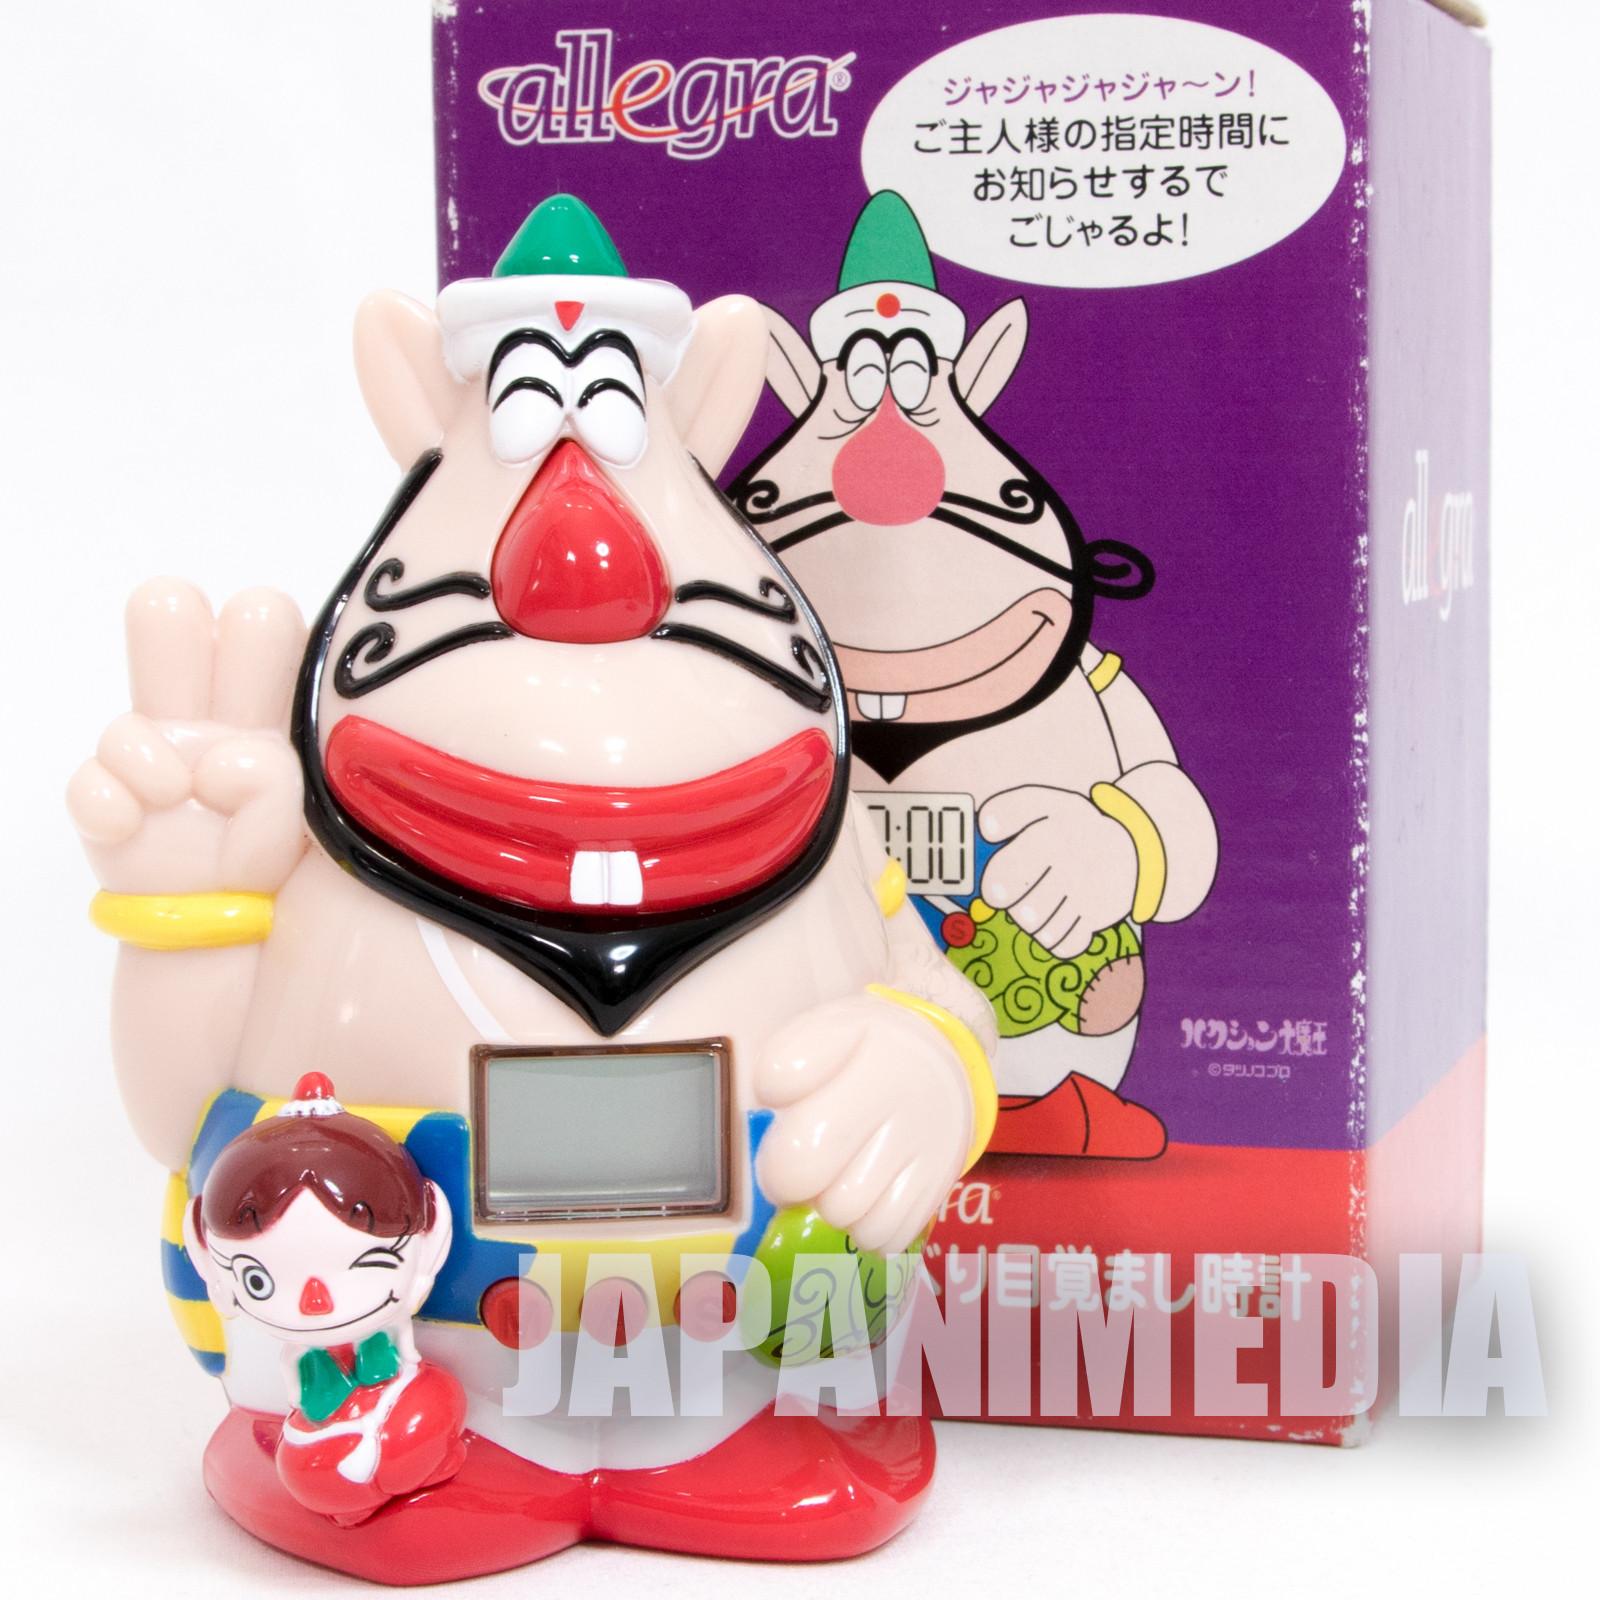 Retro The Genie Family Hakushon Daimaoh Bob Figure Voice Alarm Clock